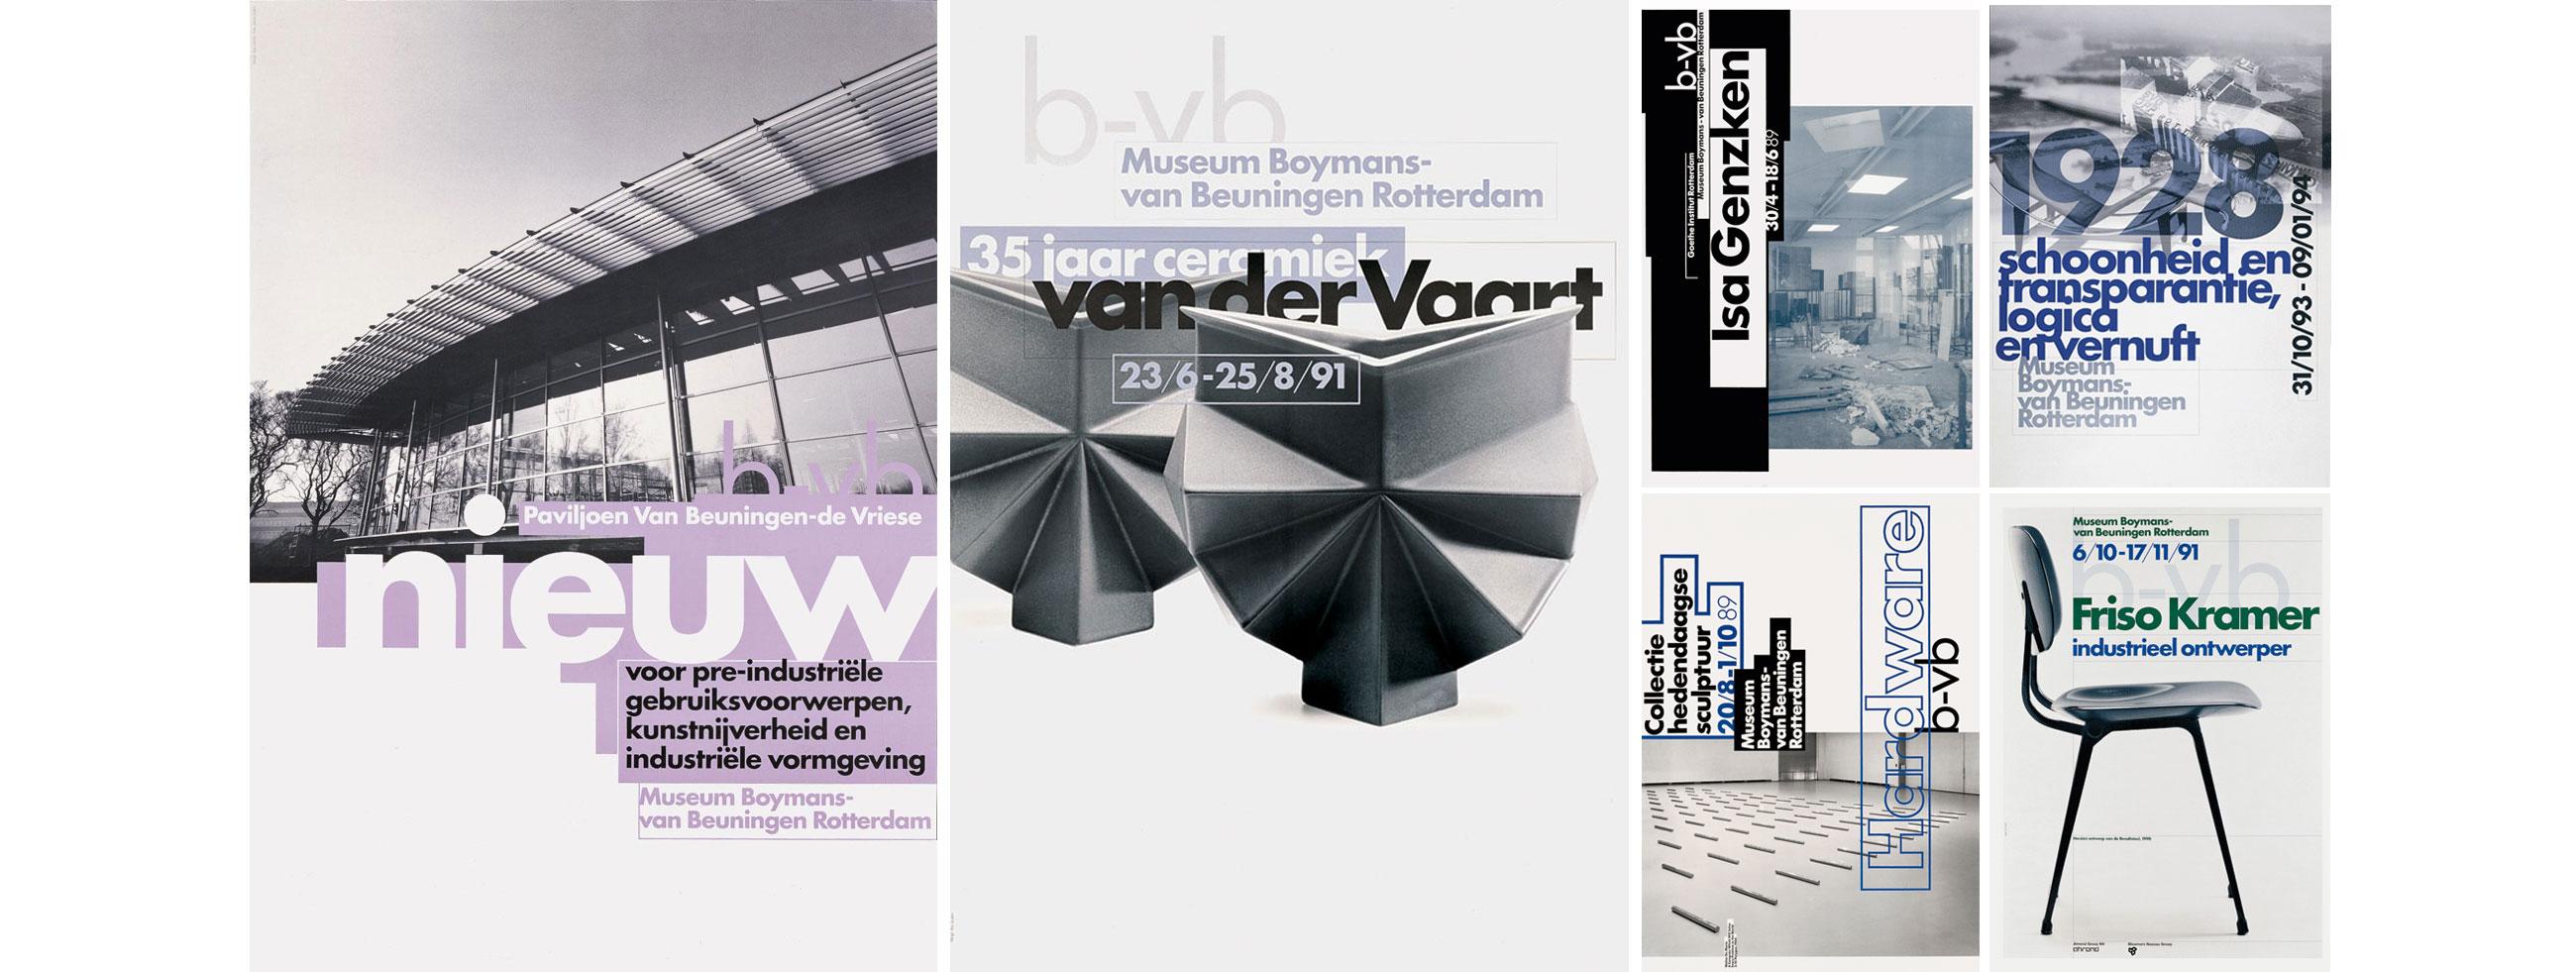 studio-8vo-UK-affiches-Museum-Boymans-van-Beuningen-Rotterdam